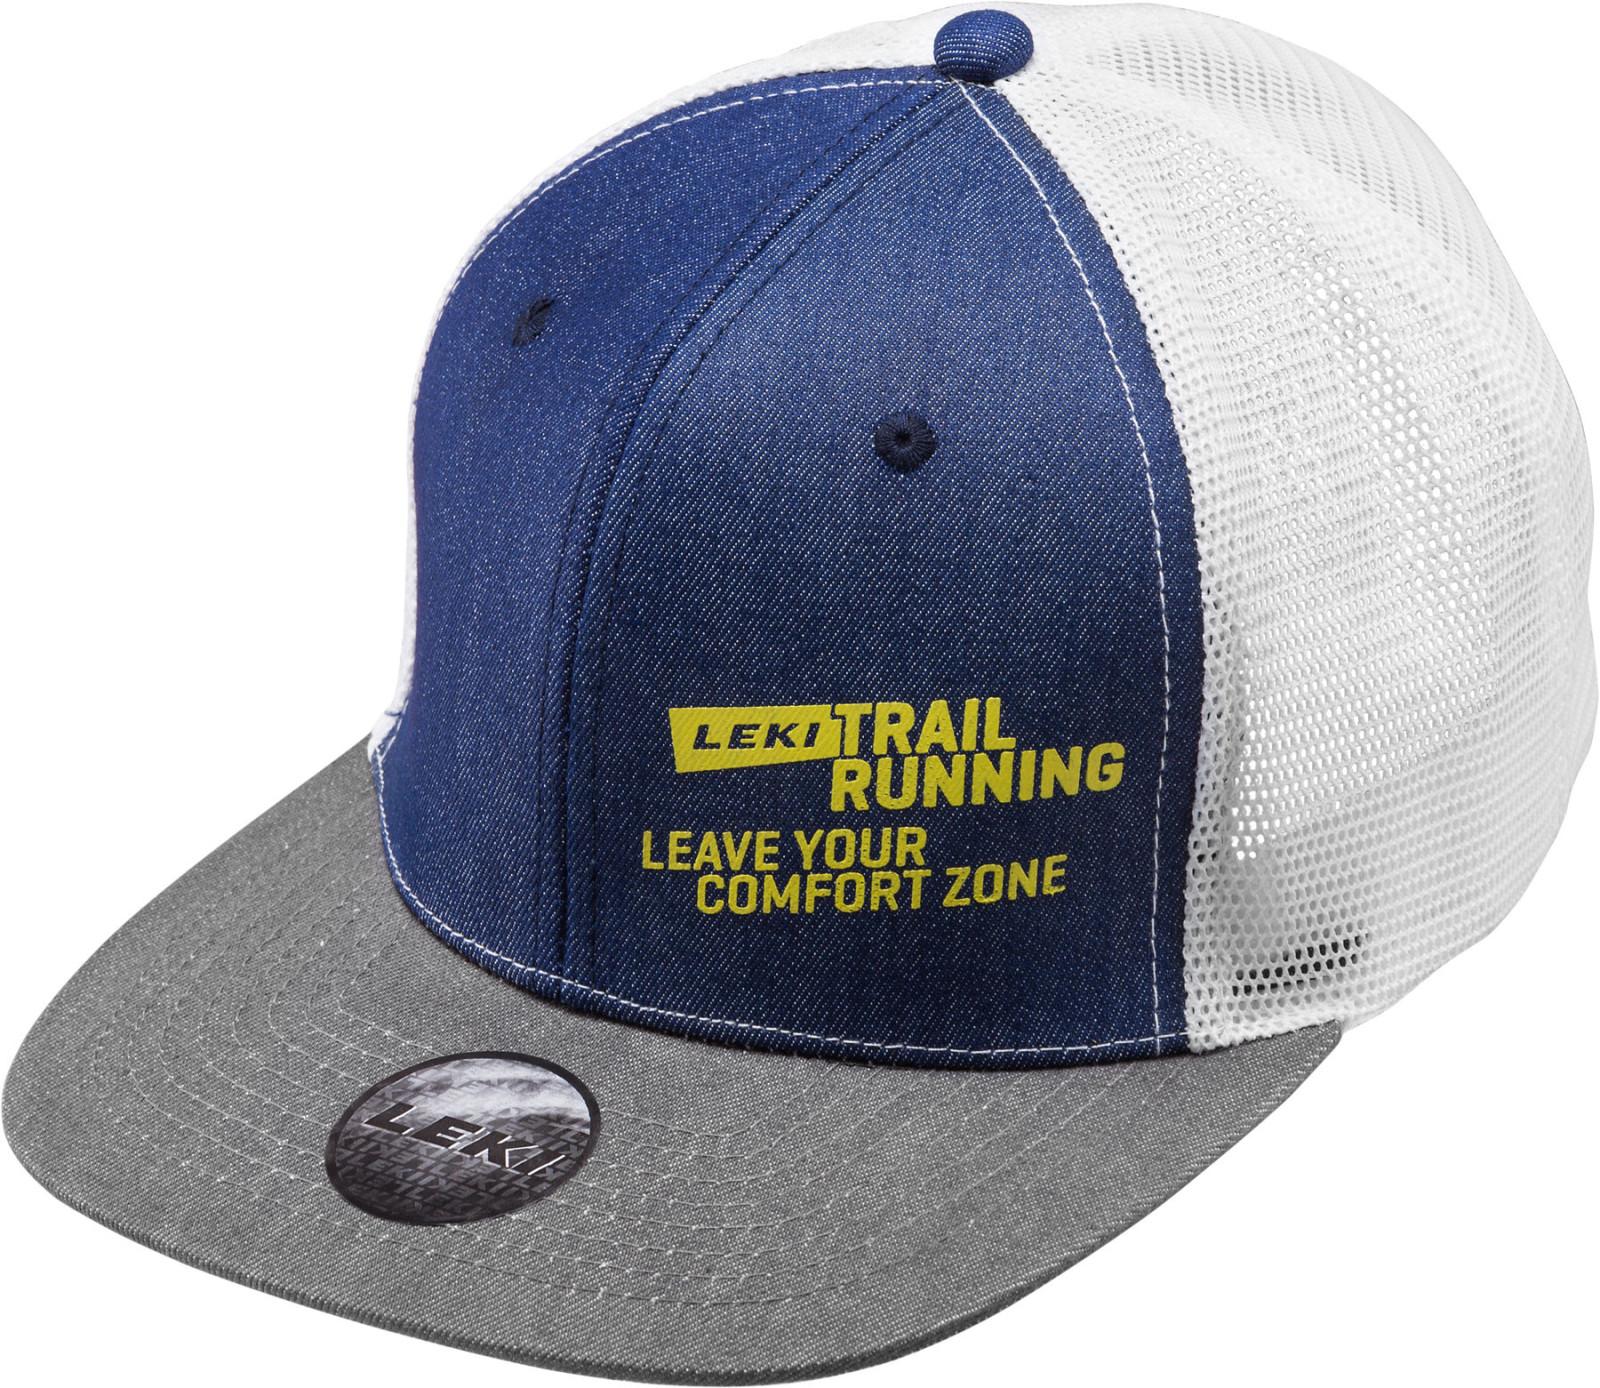 Leki Trail Running Trucker Cap